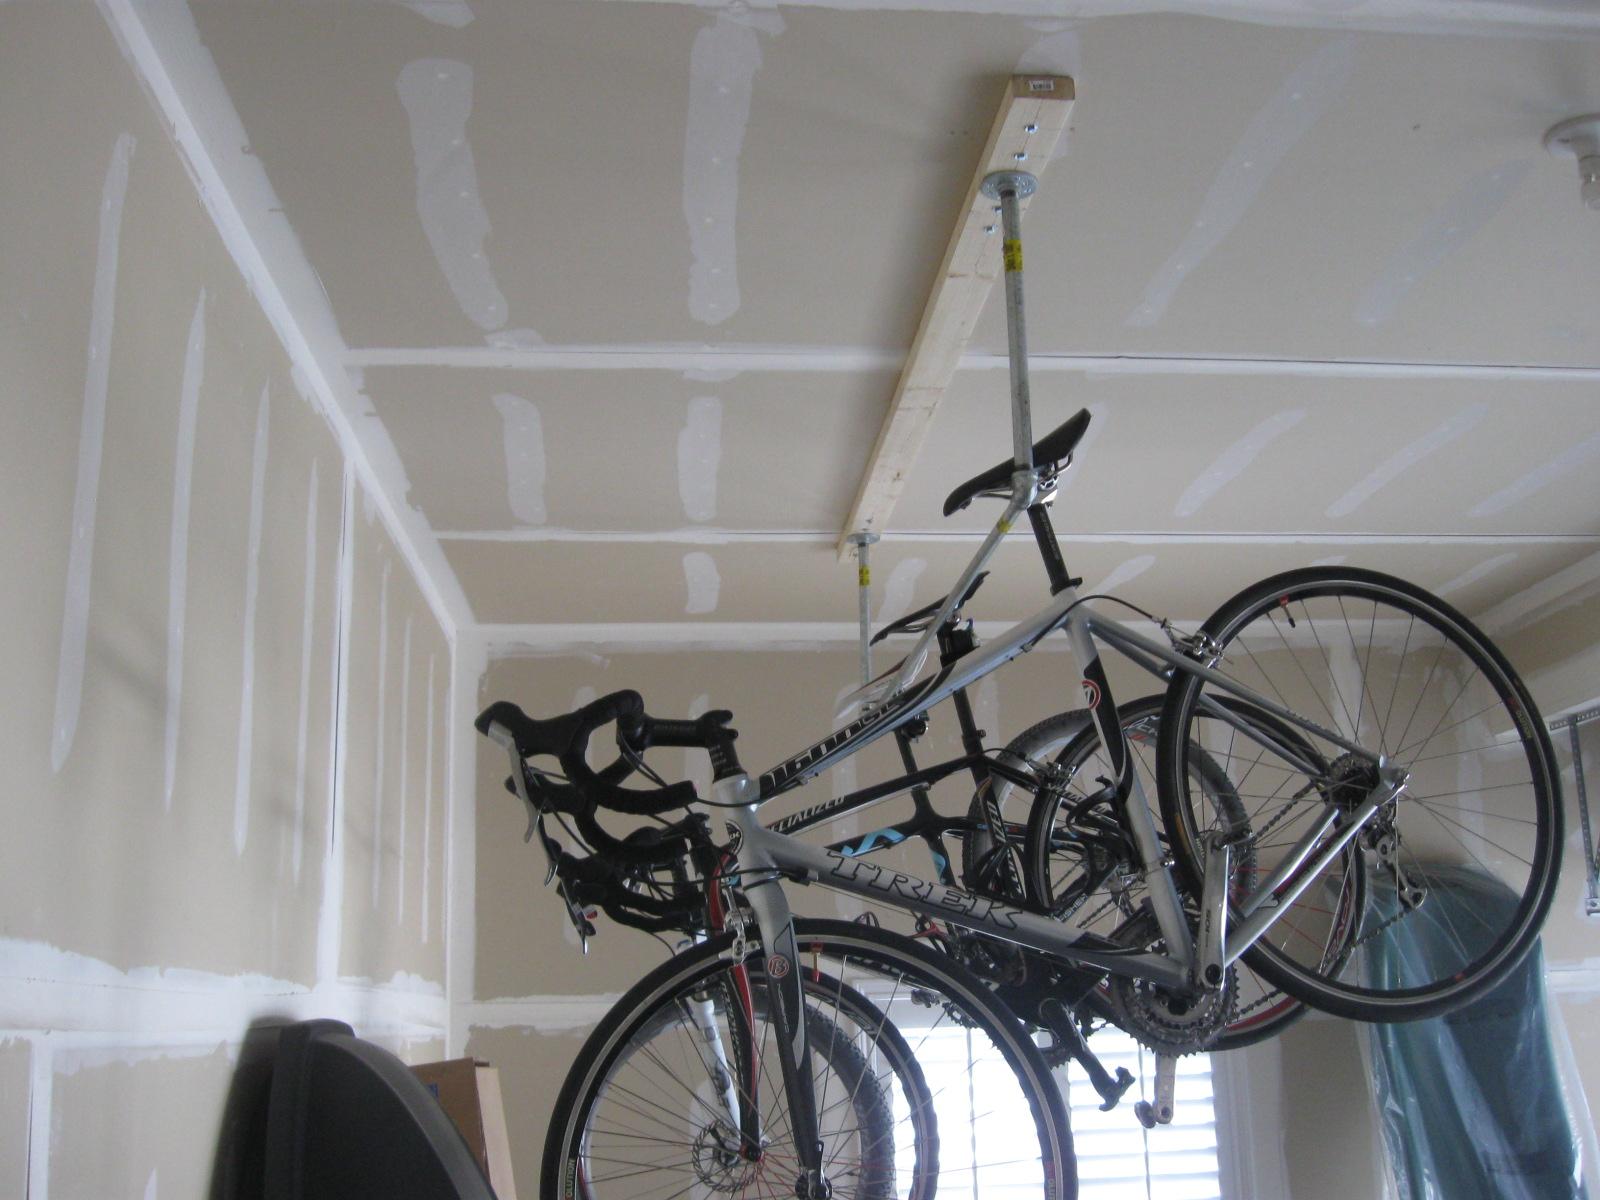 Garage Ceiling Bike Rack